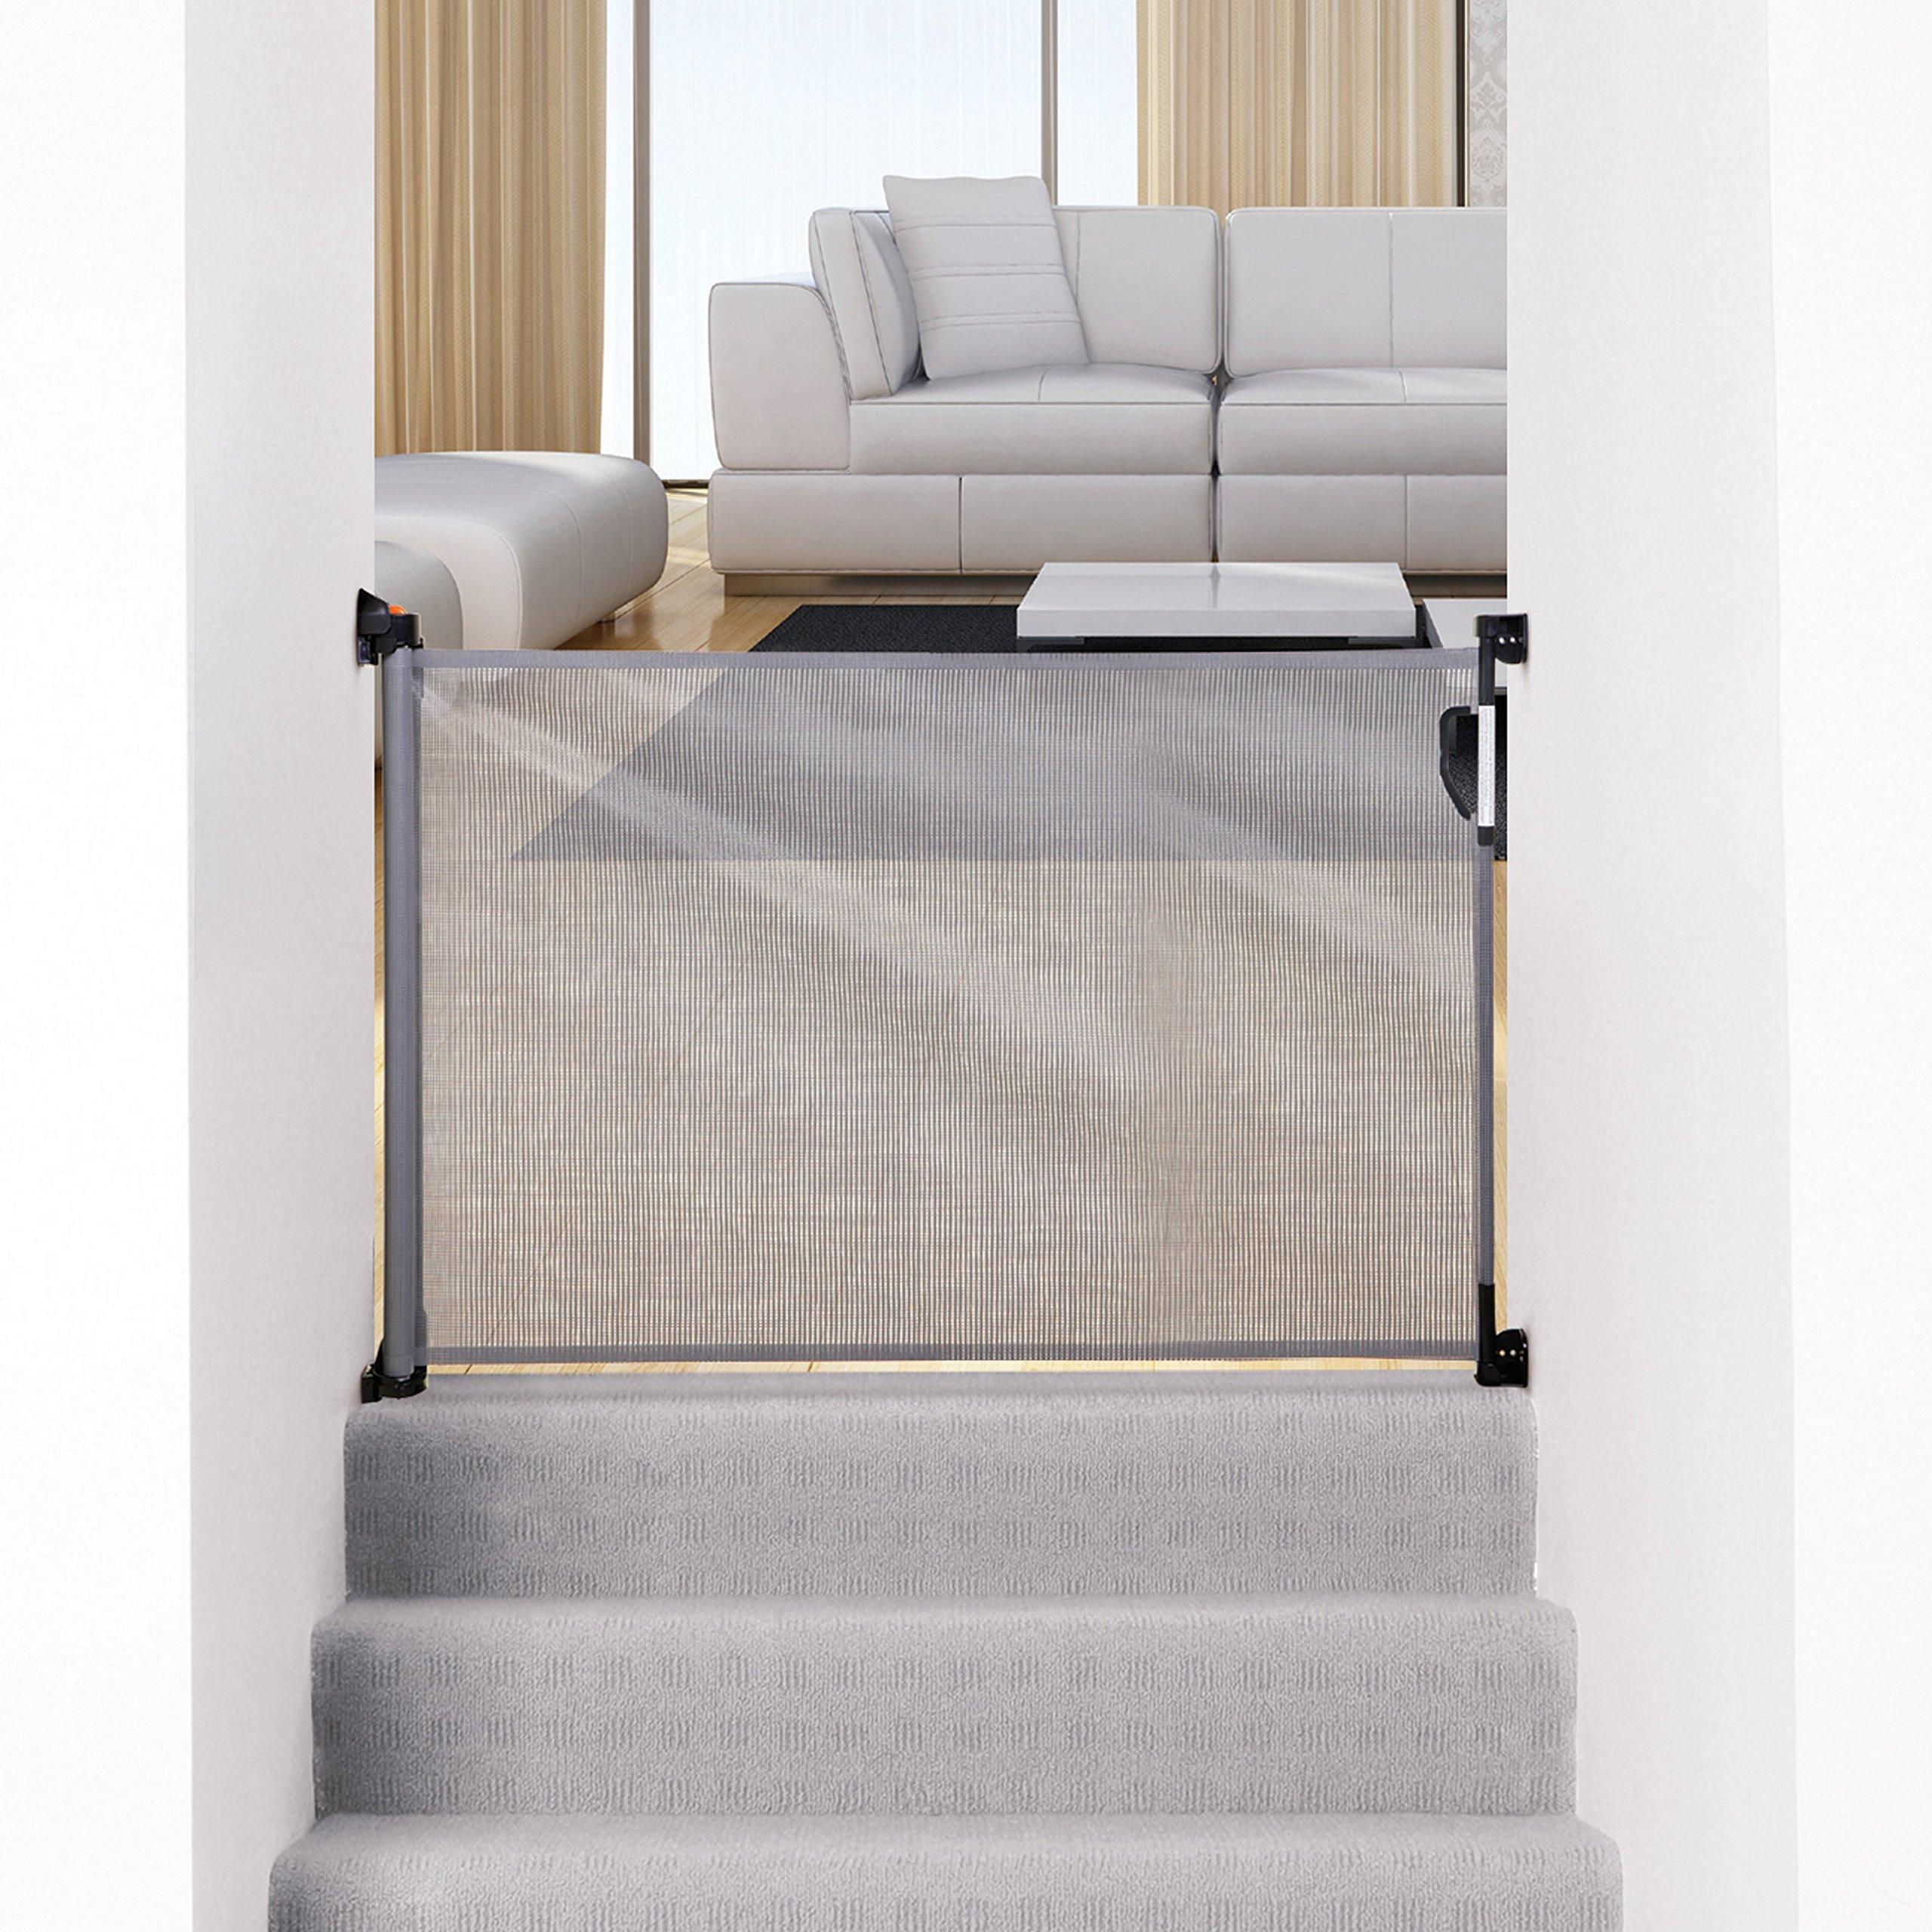 Dreambaby Retractable Gate, Grey by Dreambaby (Image #7)